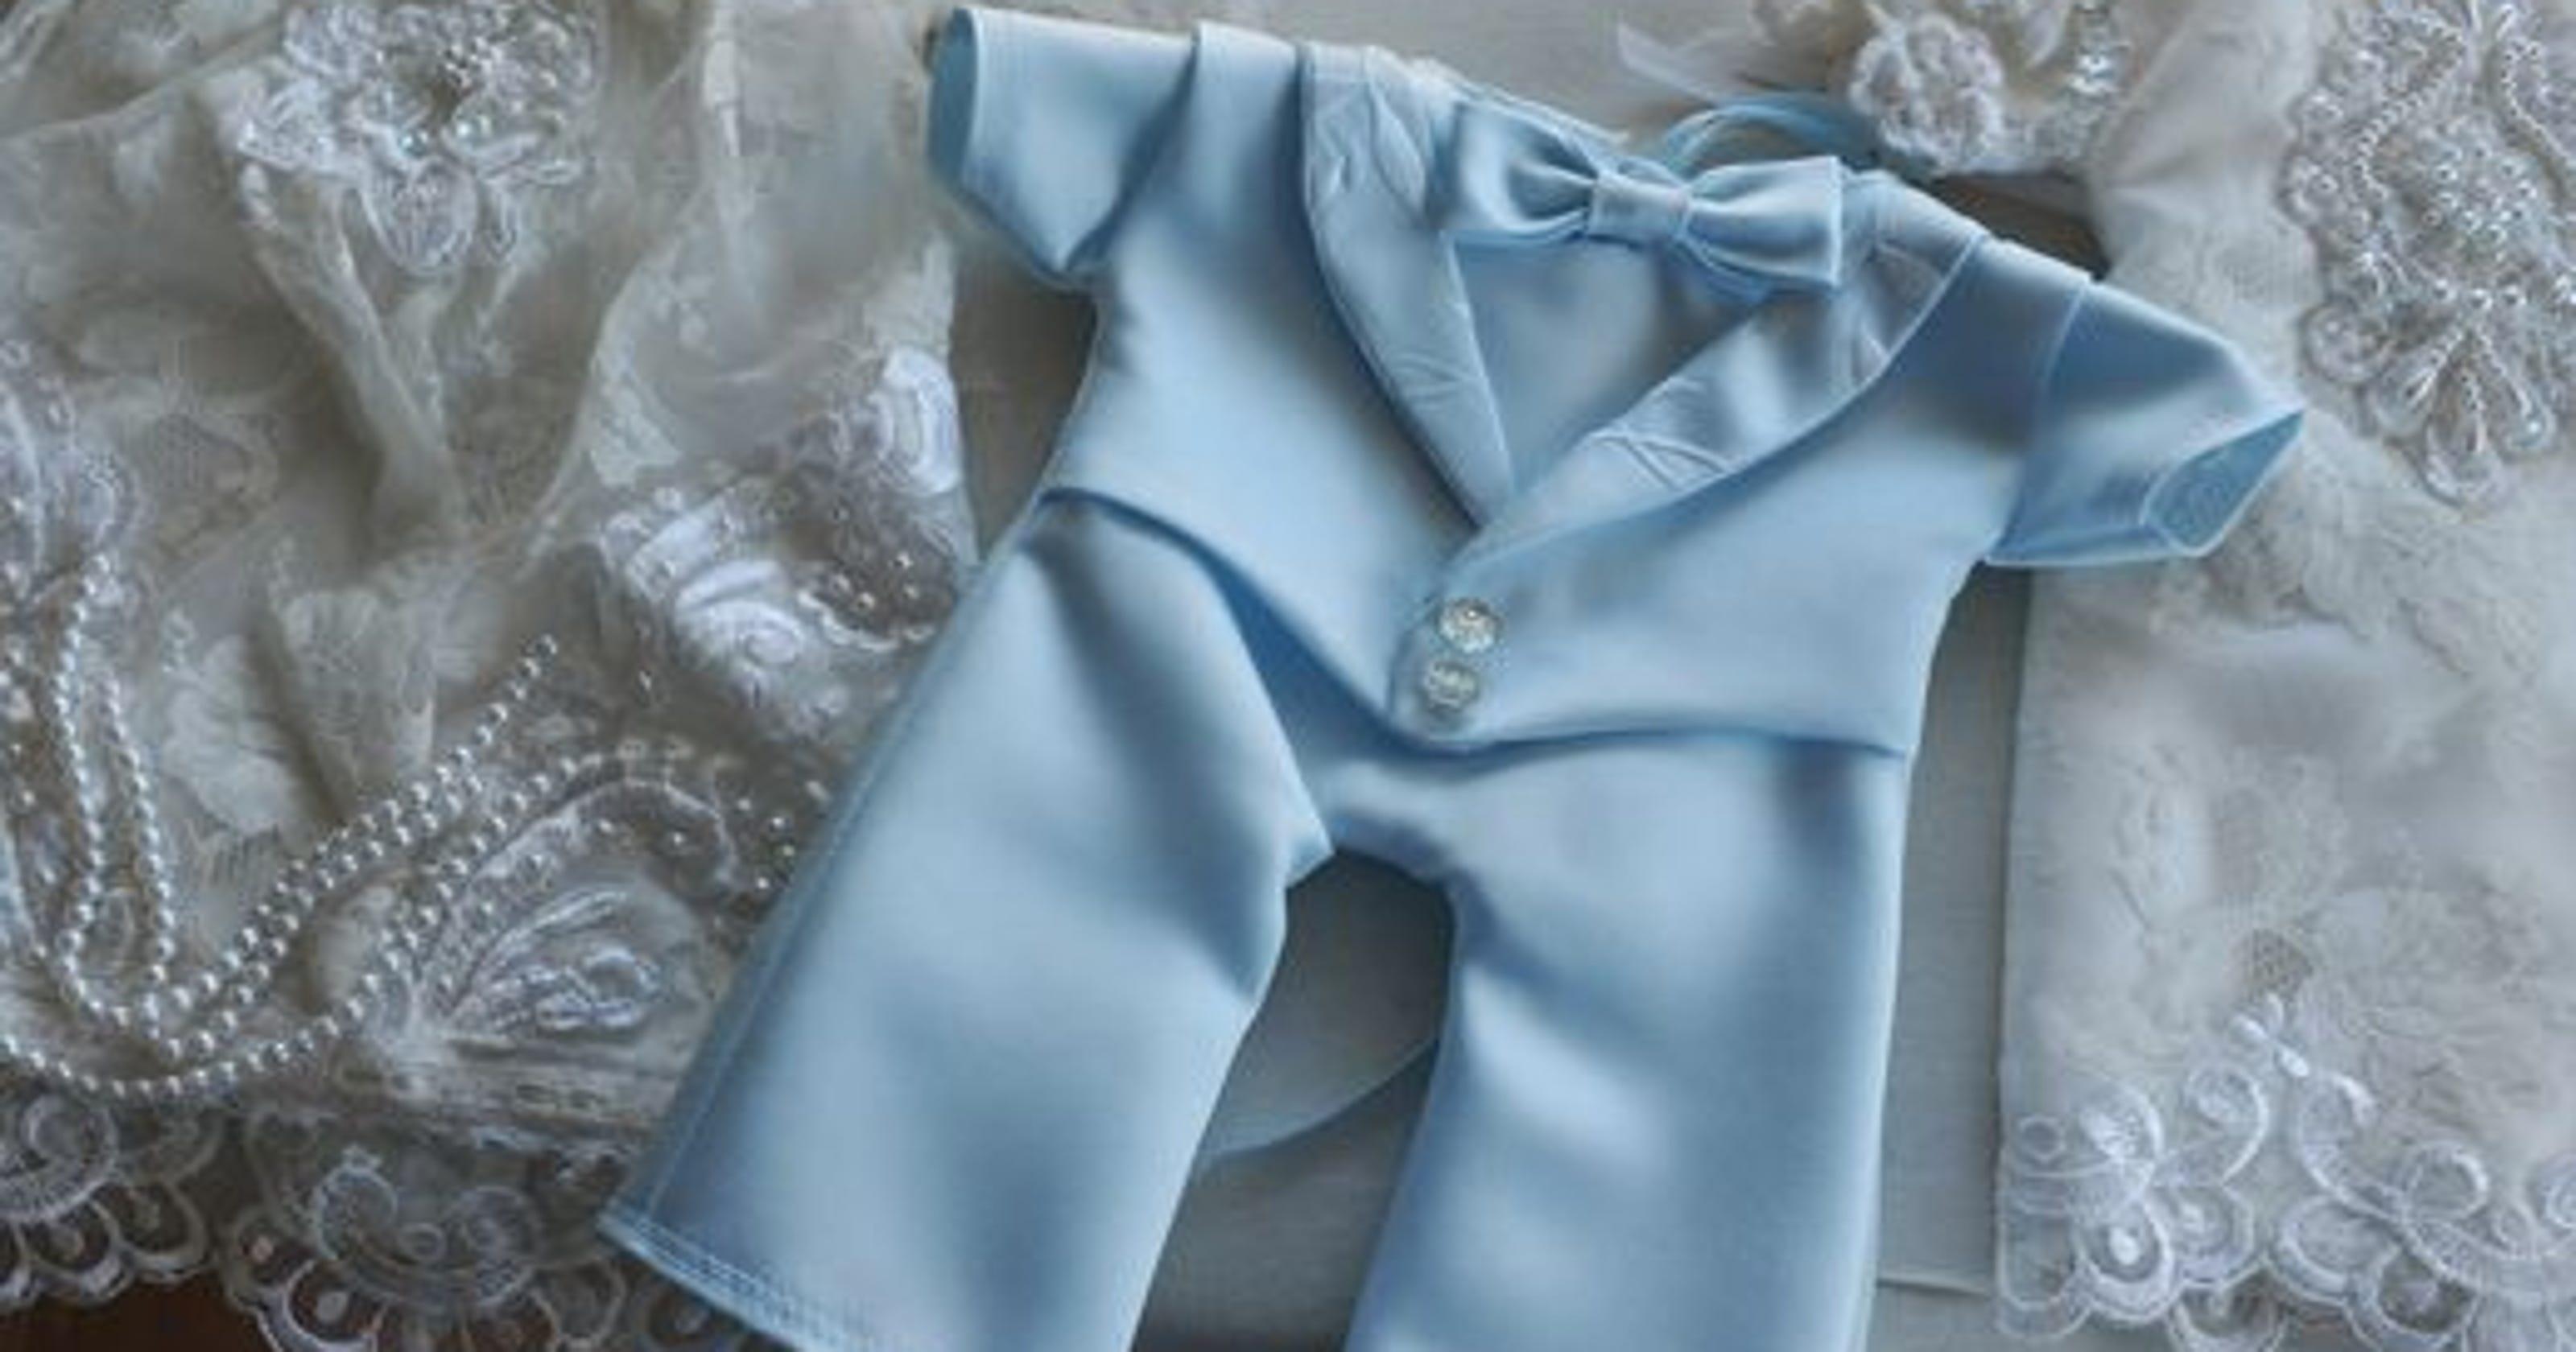 Volunteers dedicate themselves to sewing \'angel gowns\'